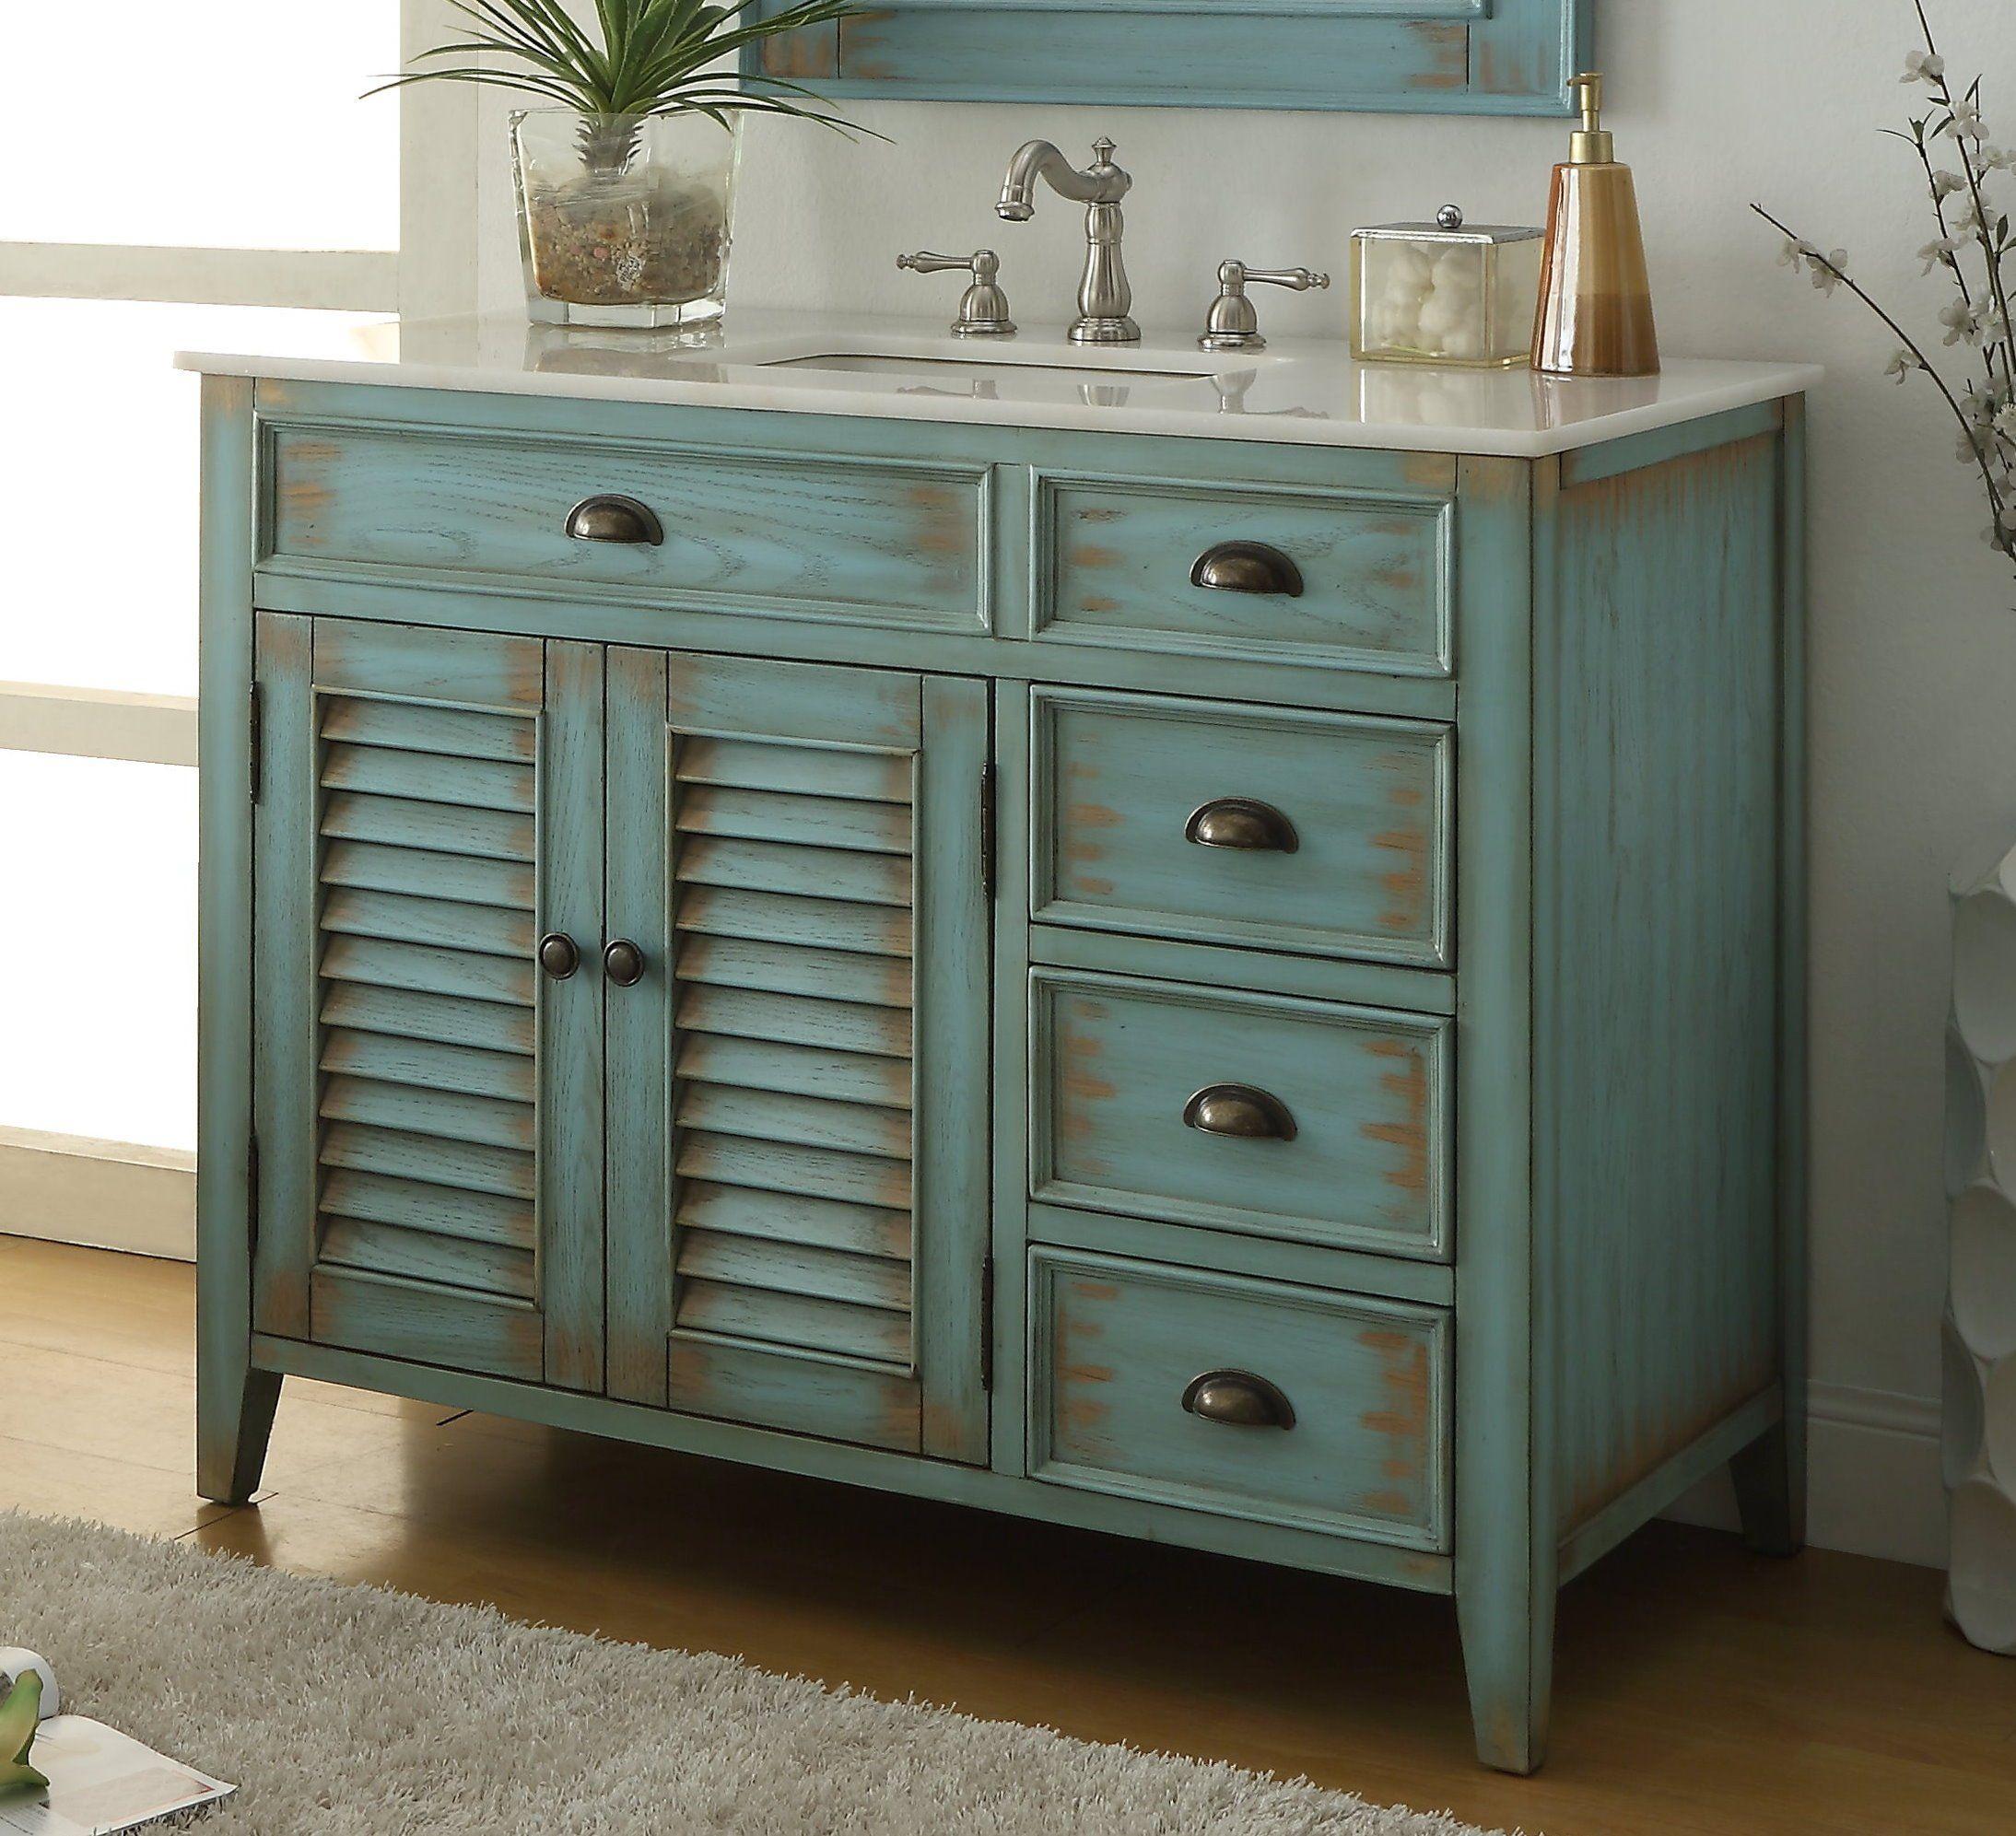 Chans furniture 42 benton collection distress blue